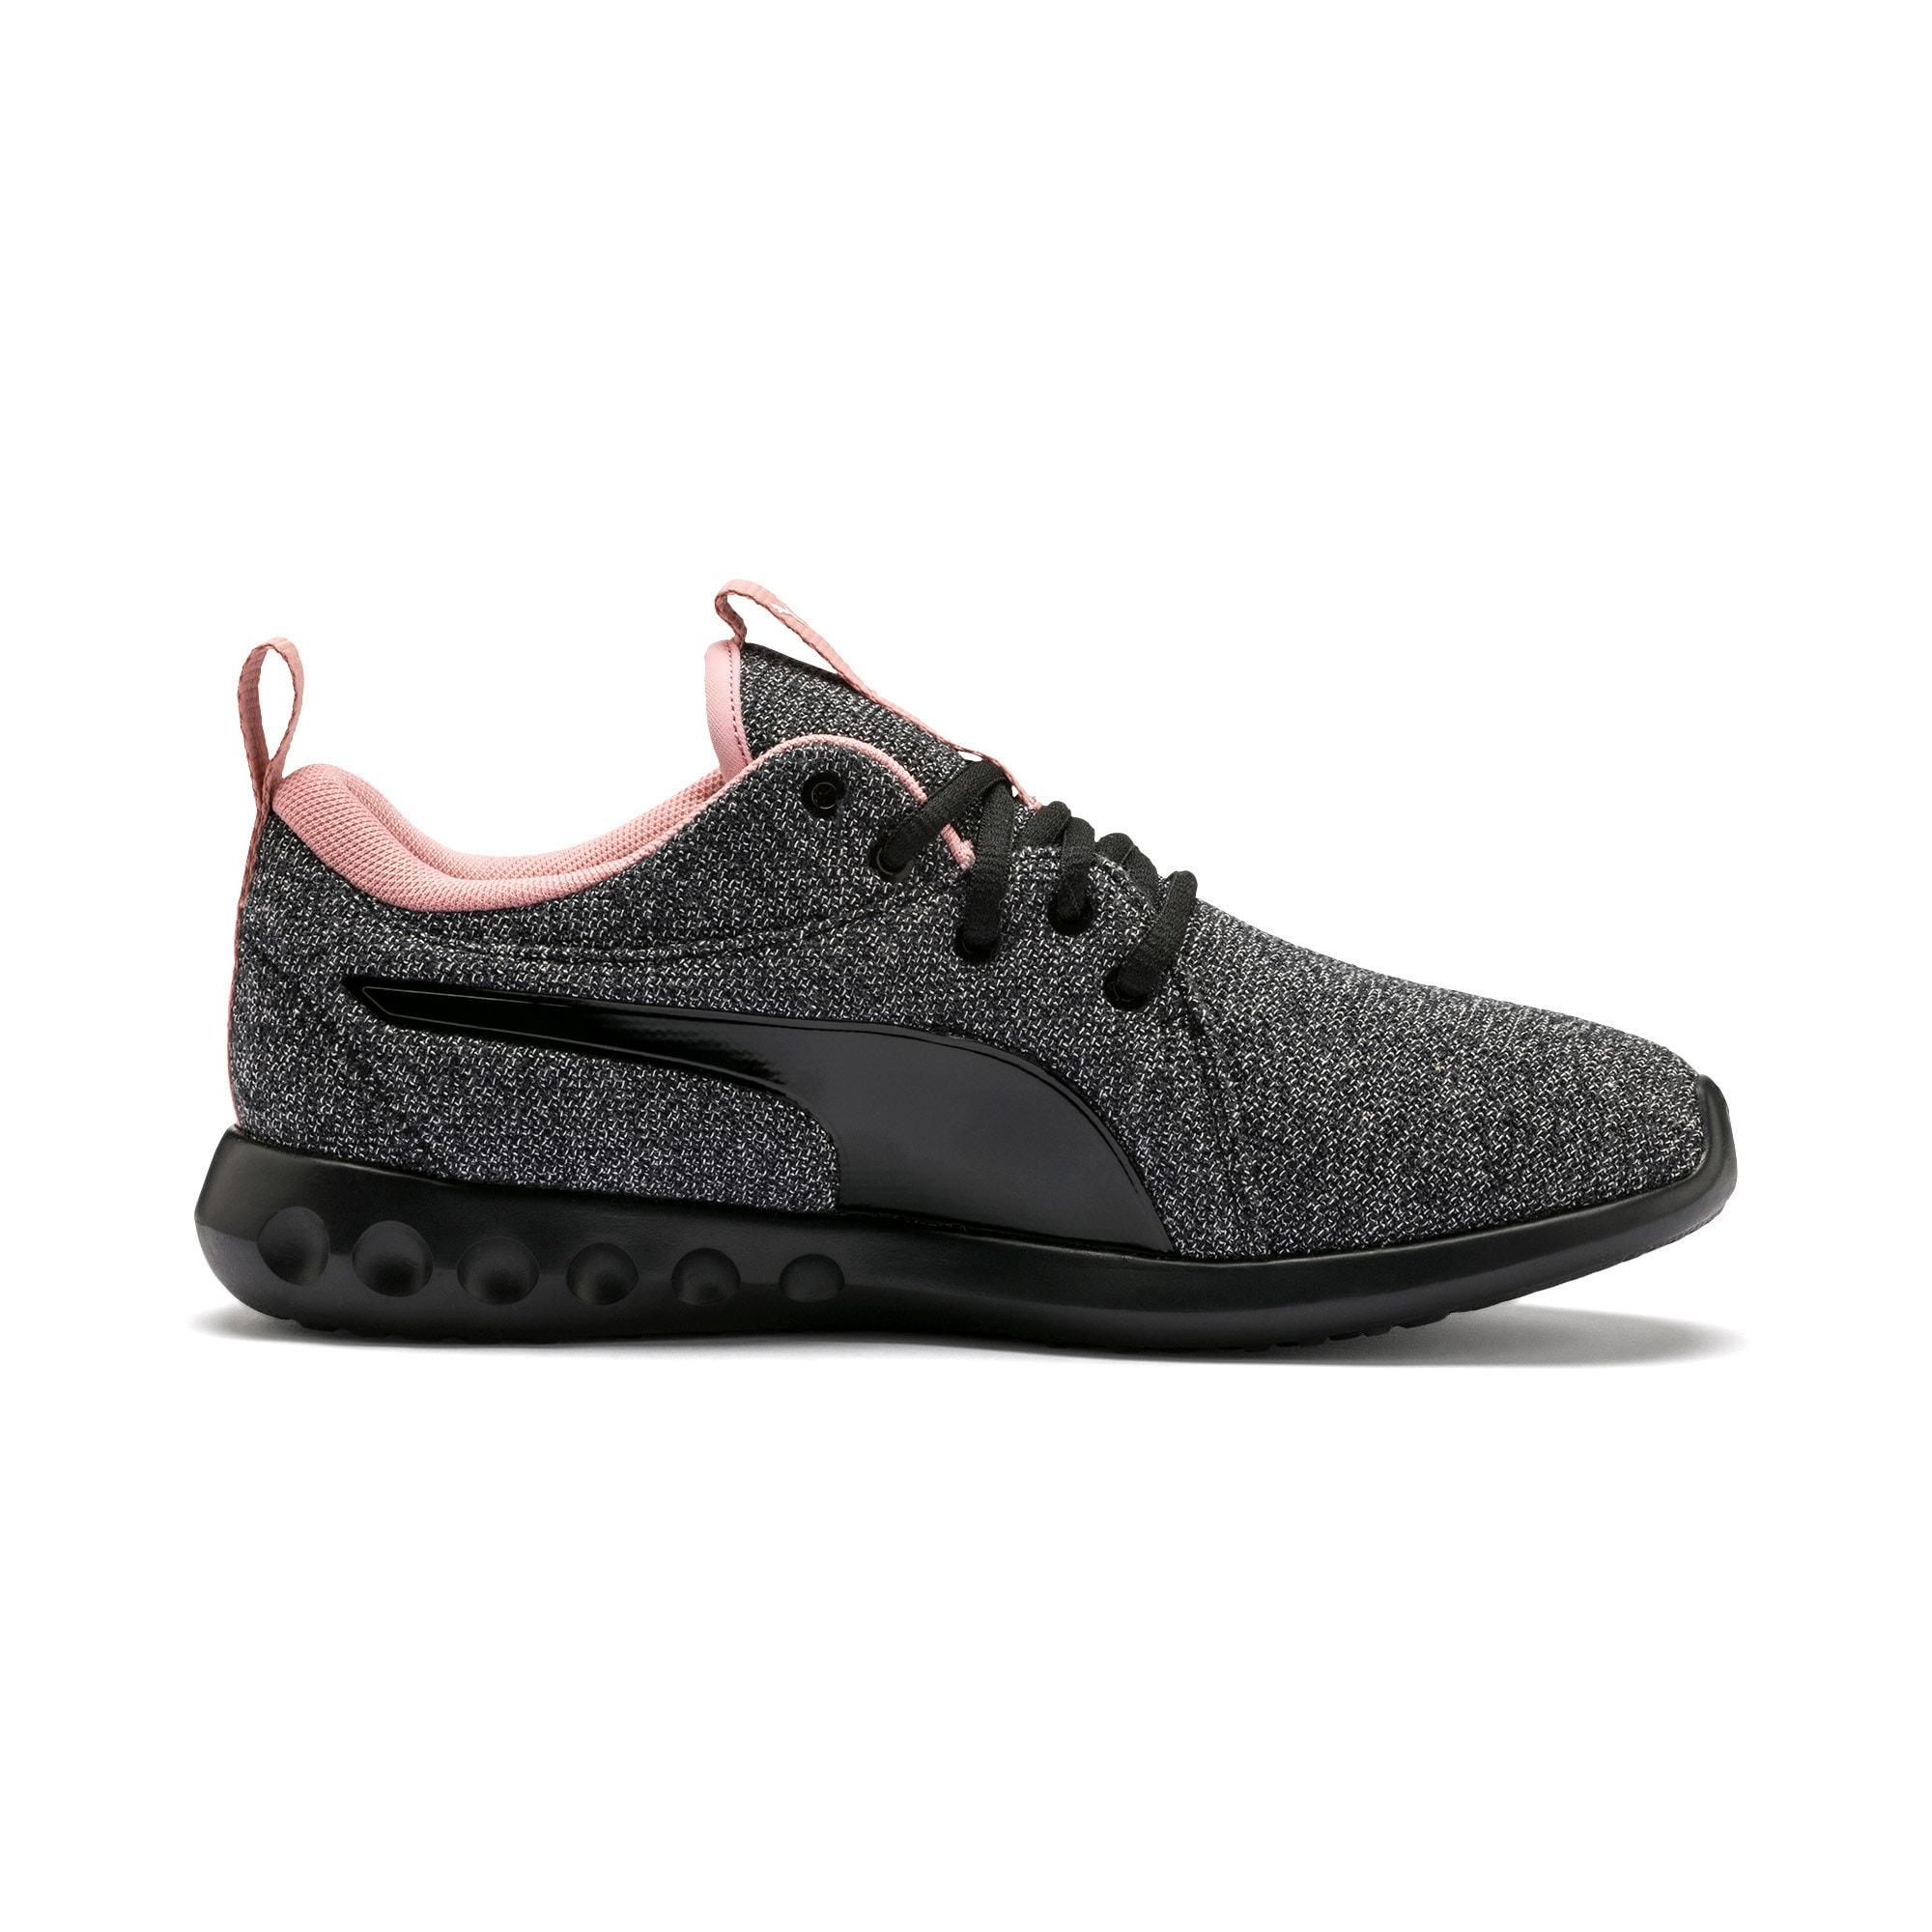 Thumbnail 6 of Carson 2 Knit Women's Running Shoes, Puma Black-White-Bridal Rose, medium